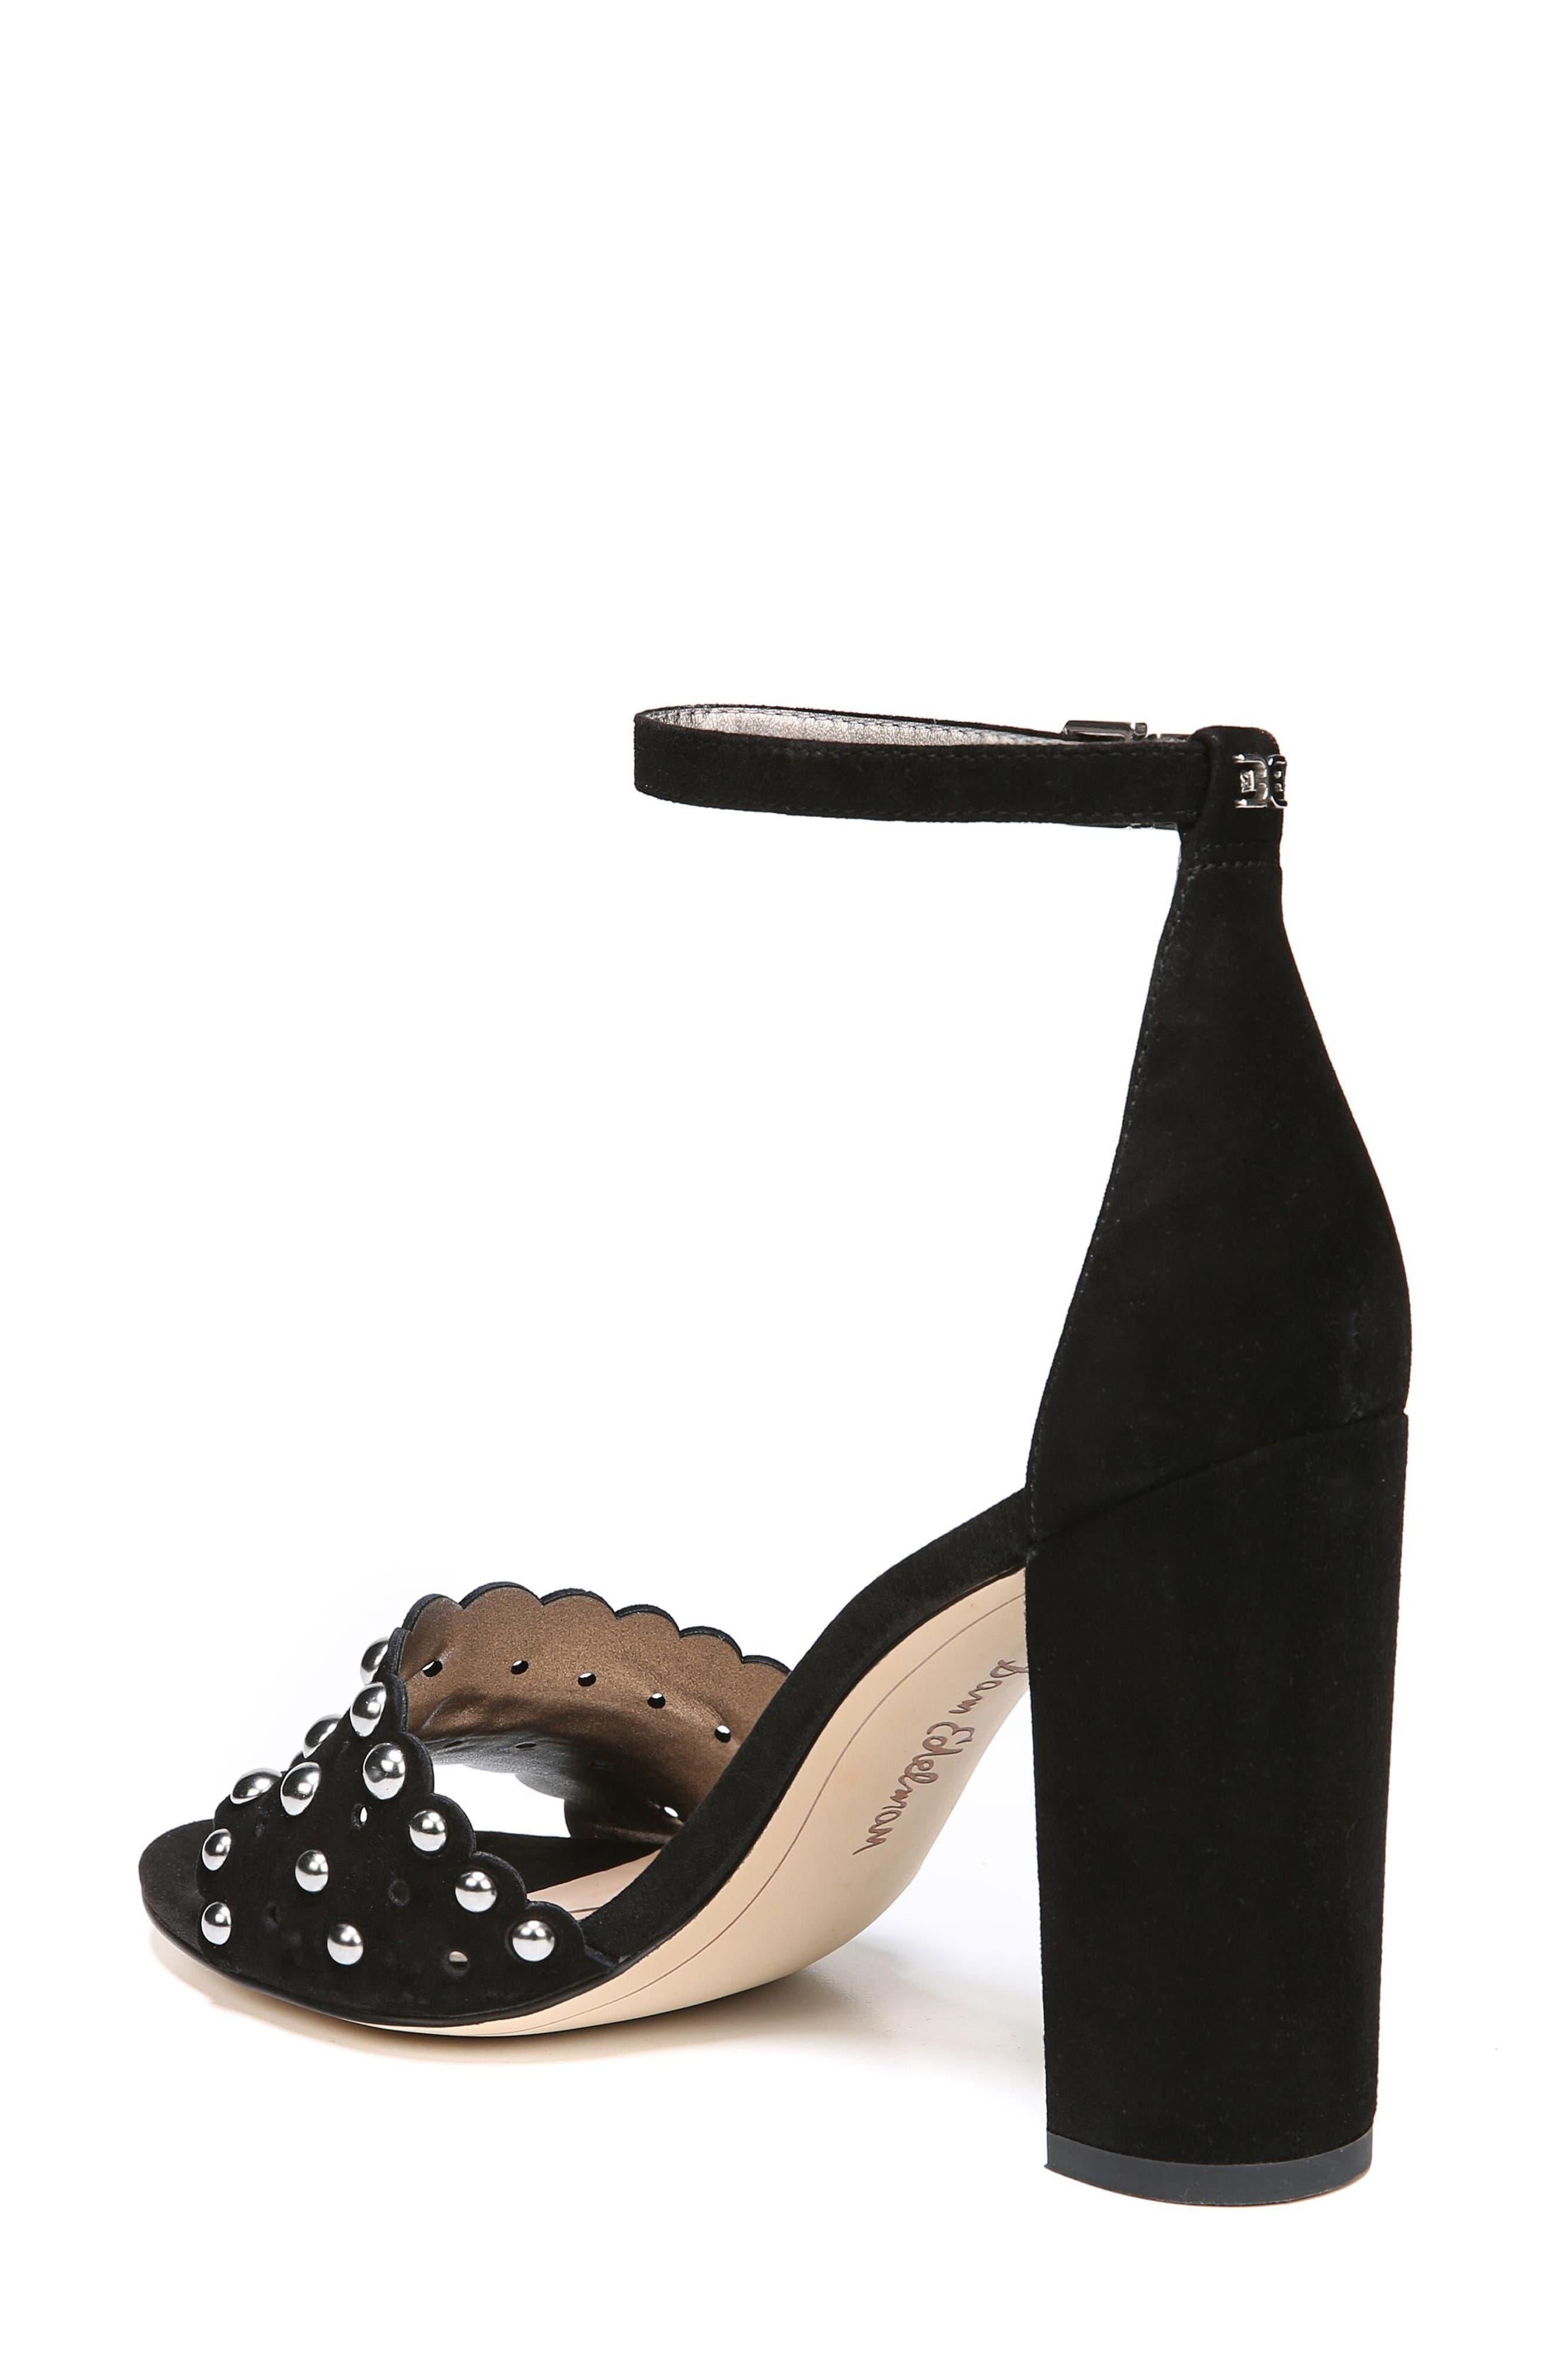 Yaria Studded Block Heel Sandal,                             Alternate thumbnail 2, color,                             001